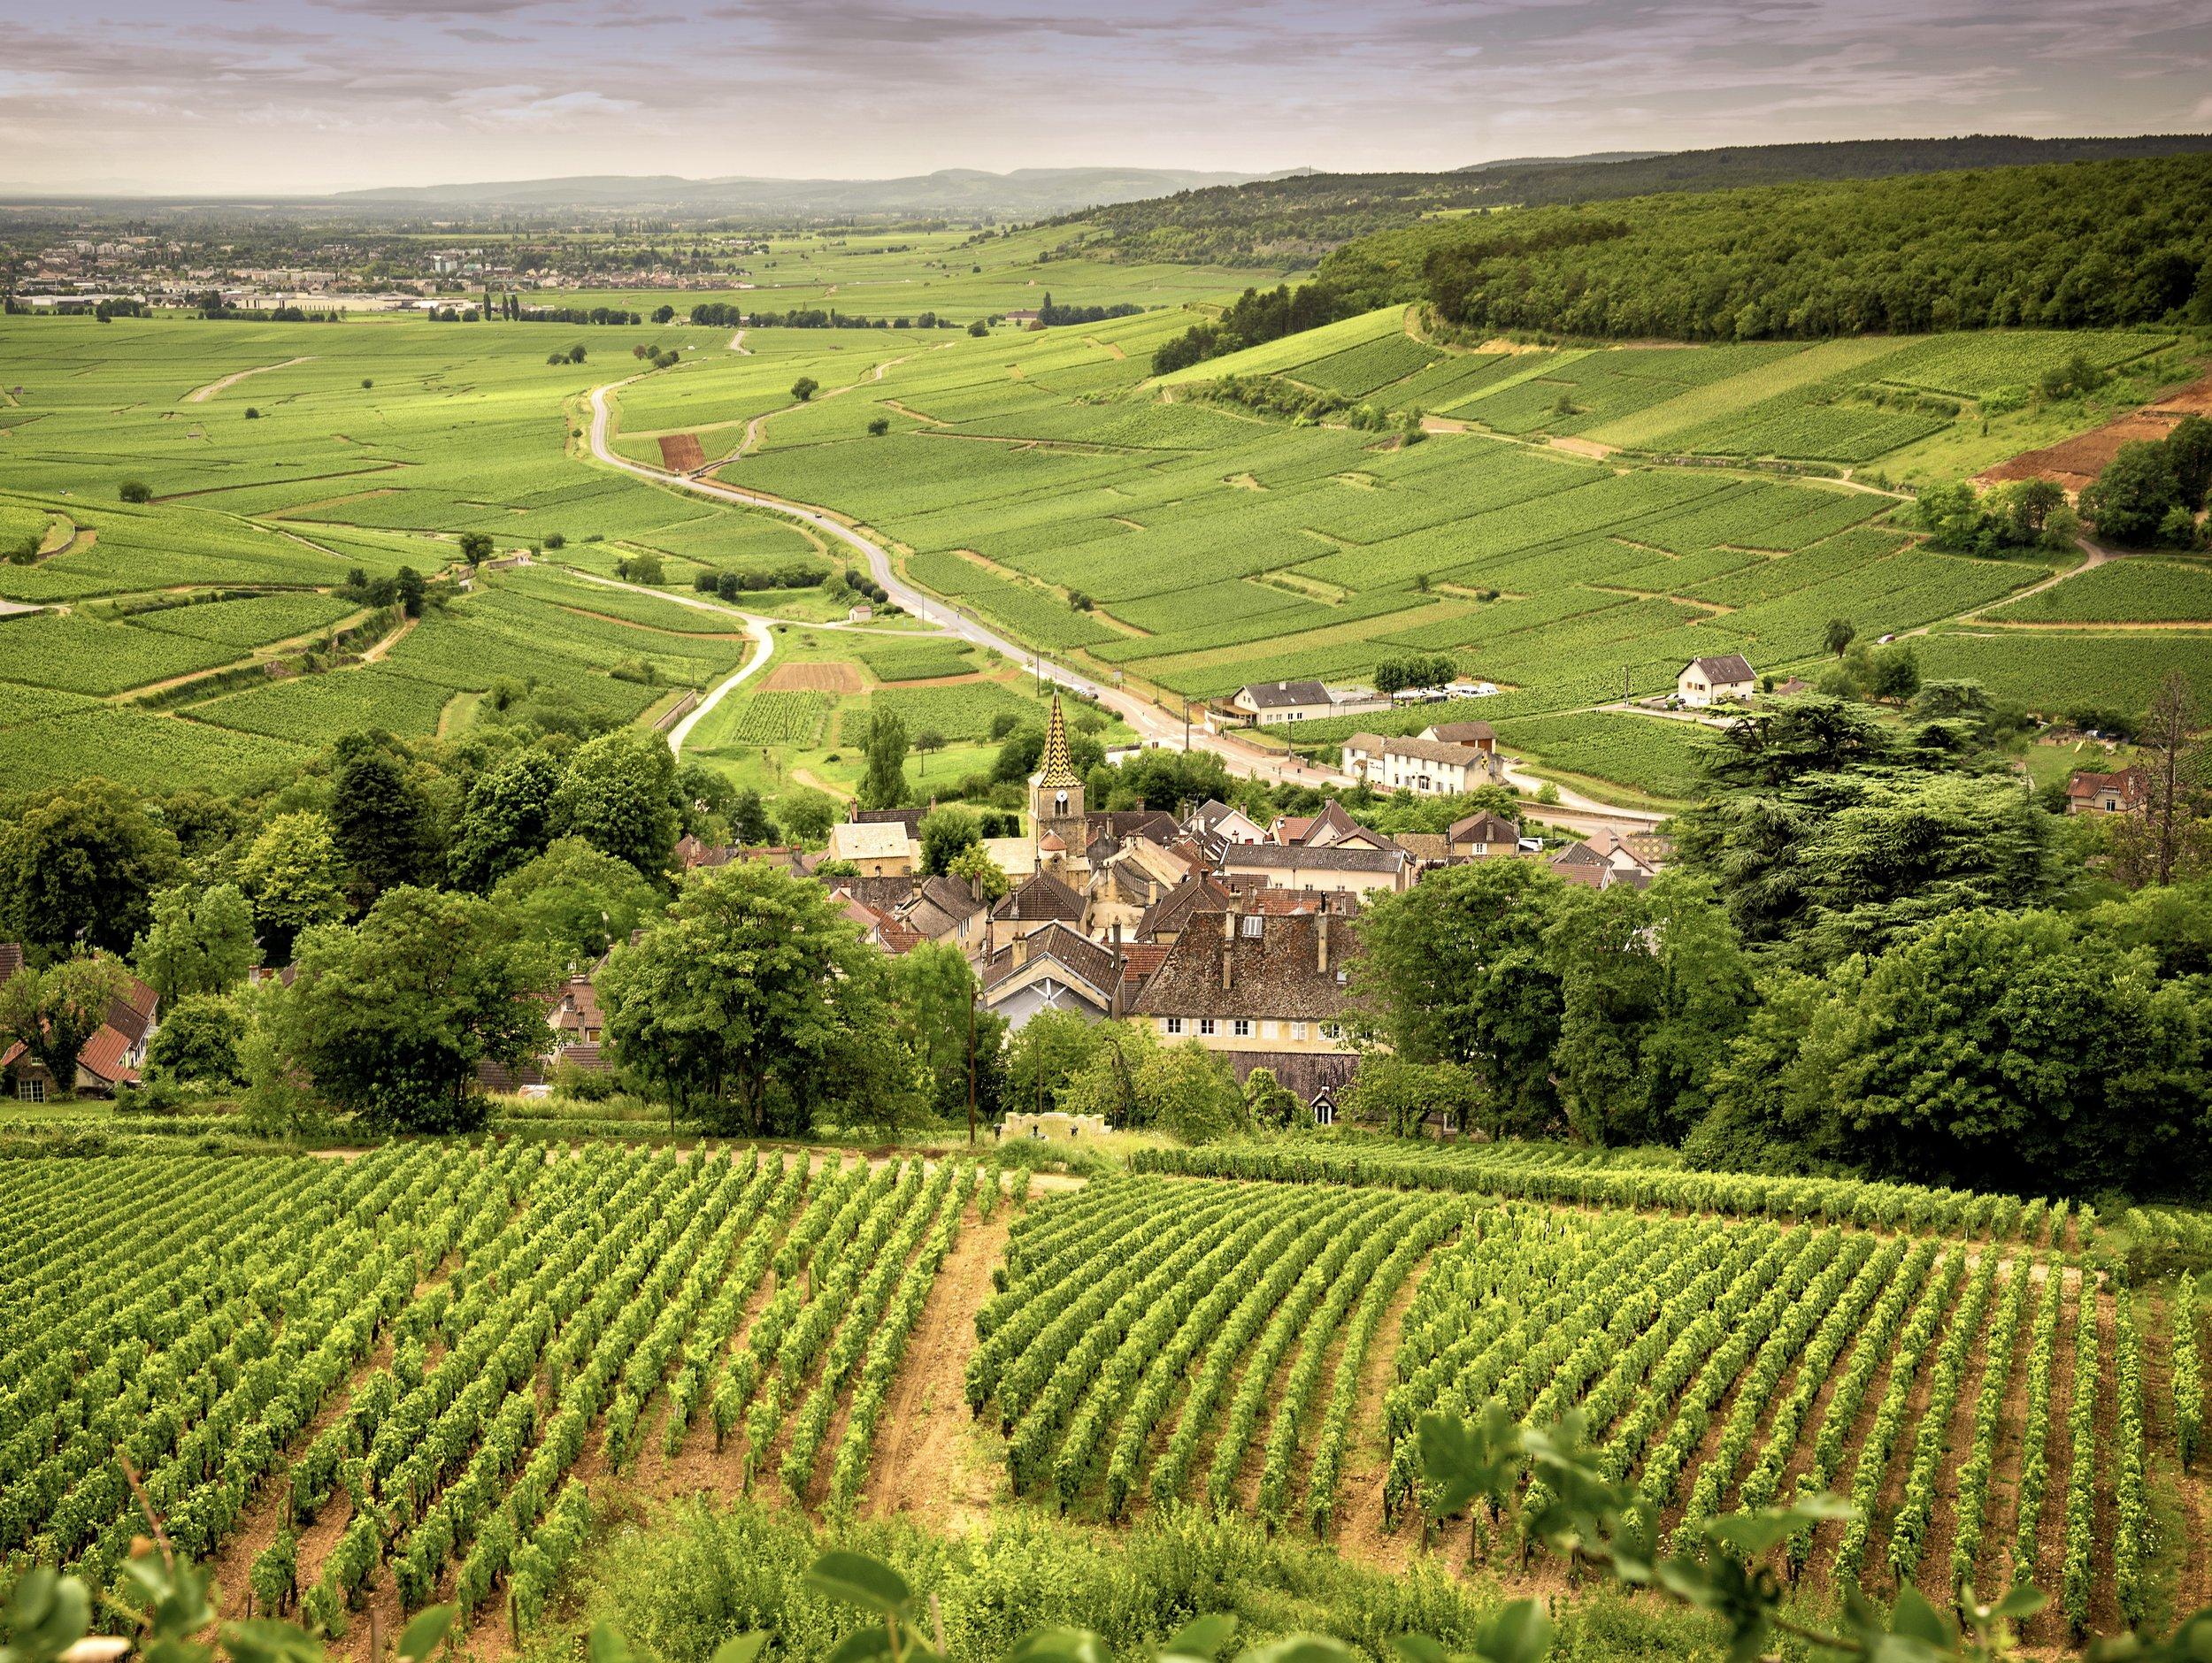 Vineyards (Photo credit: Massimo Santi, Shutterstock)